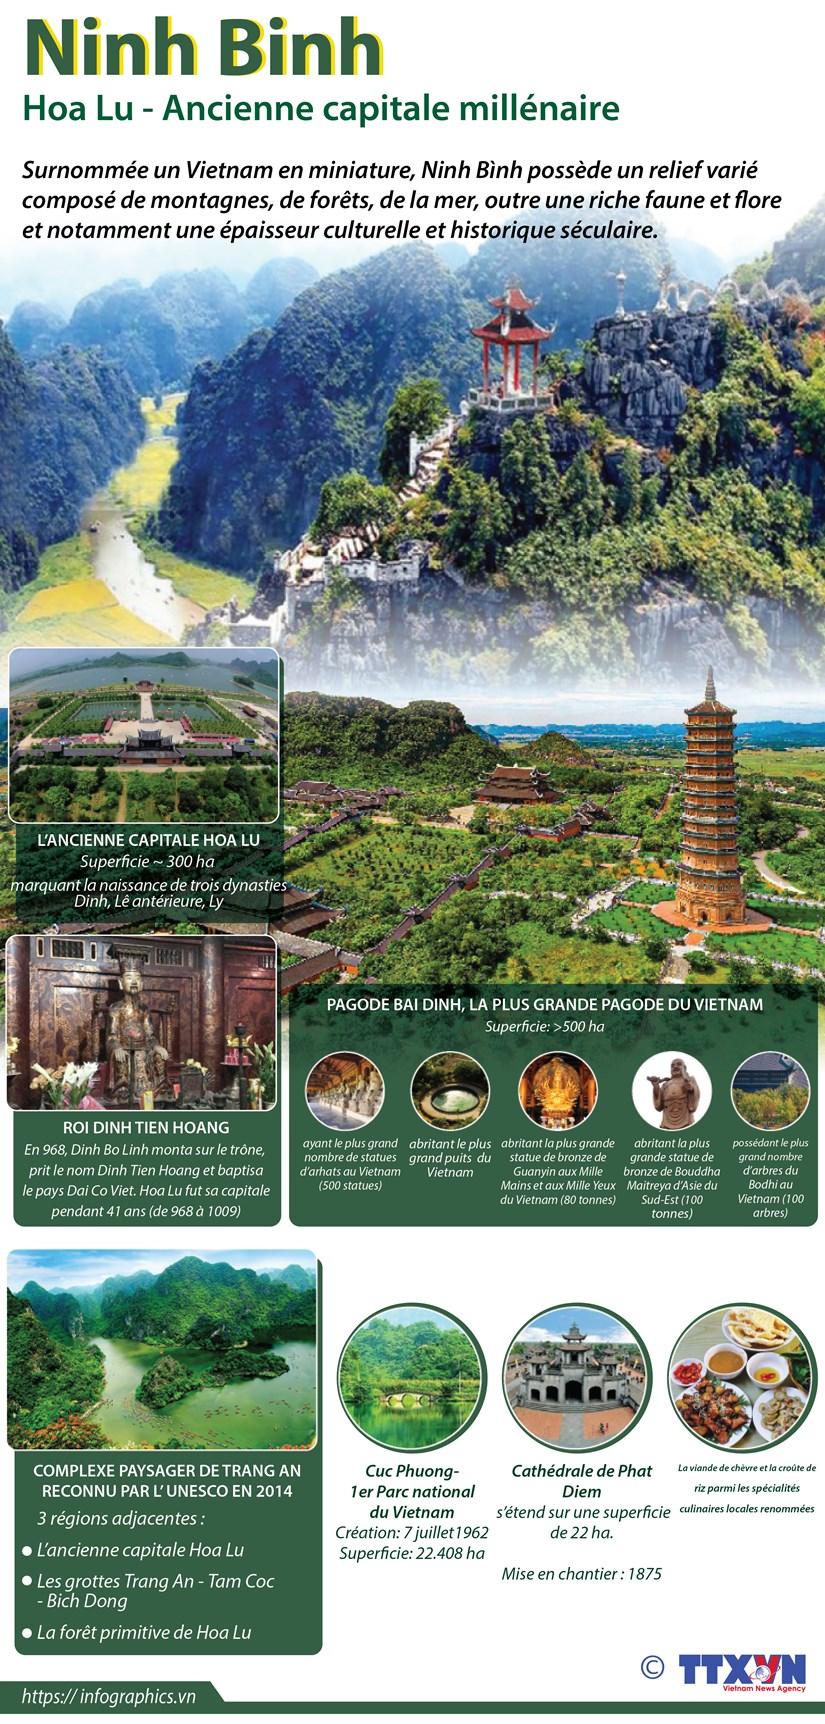 Hoa Lu - Ancienne capitale millenaire a Ninh Binh hinh anh 1